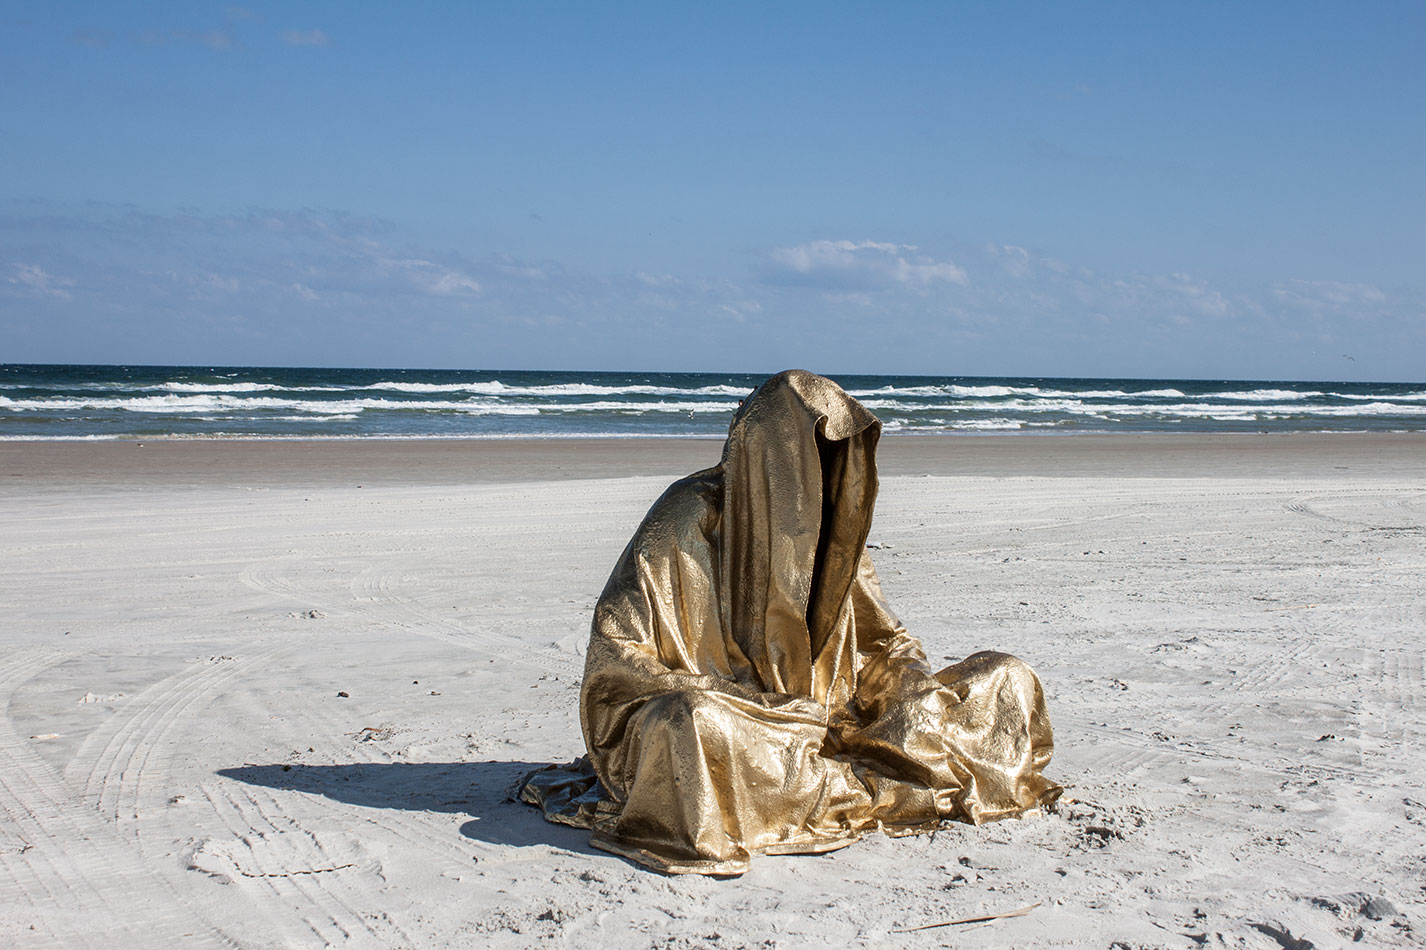 art-basel-miami-beach-fair-usa-florida-guardians-of-time-manfred-kili-kielnhofer-contemporary-fine-art-modern-arts-design-antiques-sculpture-5120